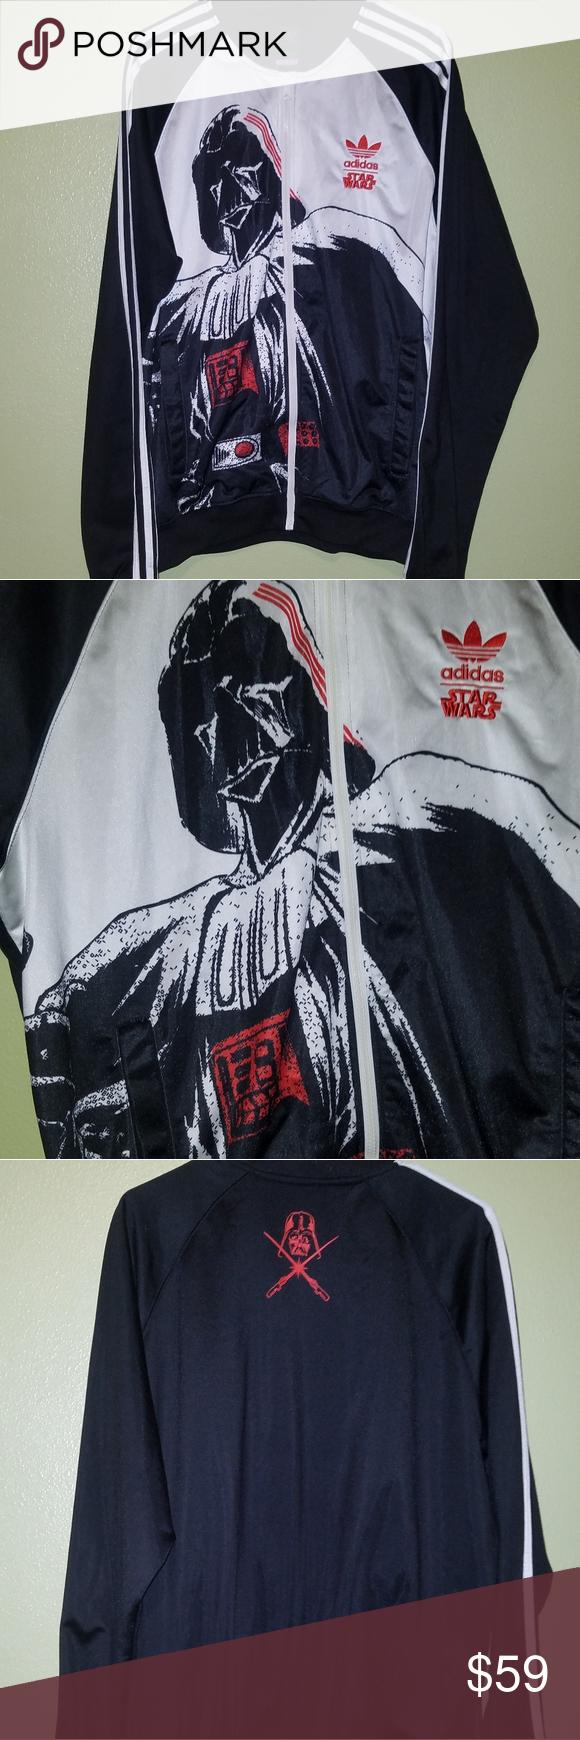 Adidas Star Wars Darth Vader Sweatshirt Jacket 2xl Adidas Star Wars Sweatshirt Jacket Star Wars Jacket [ 1740 x 580 Pixel ]